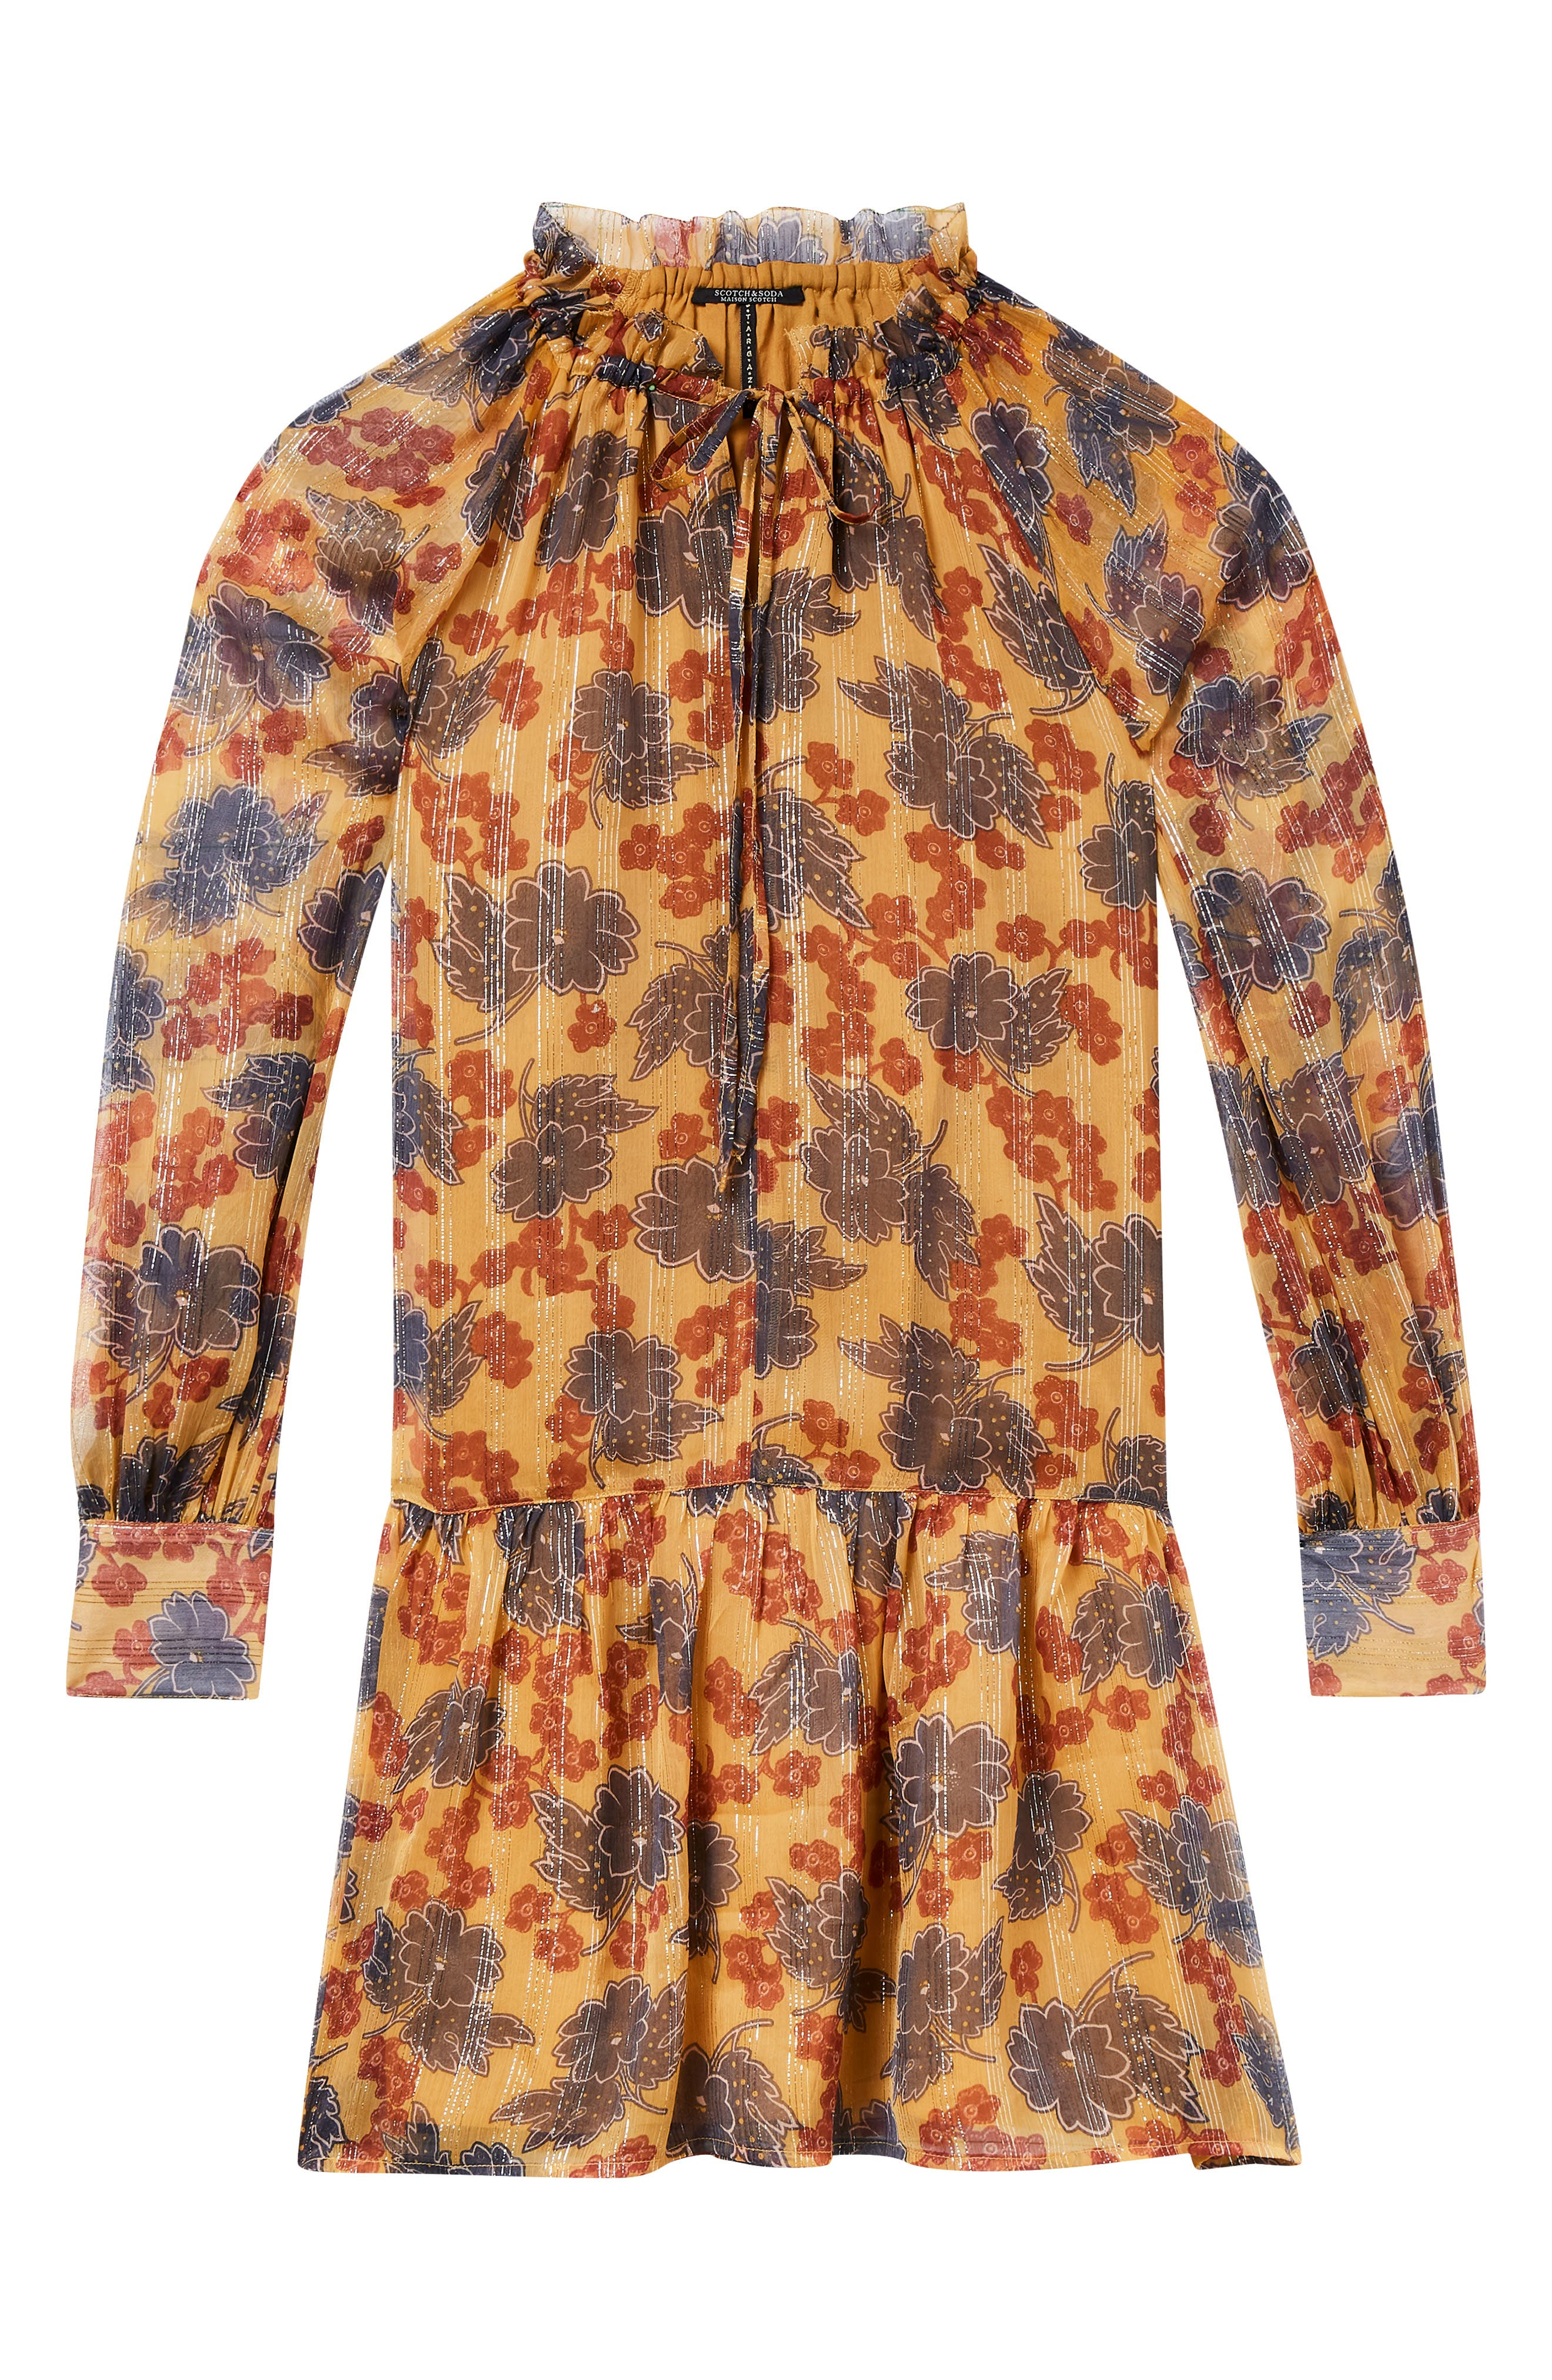 Metallic Stripe Floral Print Dress,                             Alternate thumbnail 6, color,                             YELLOW AND BURGUNDY